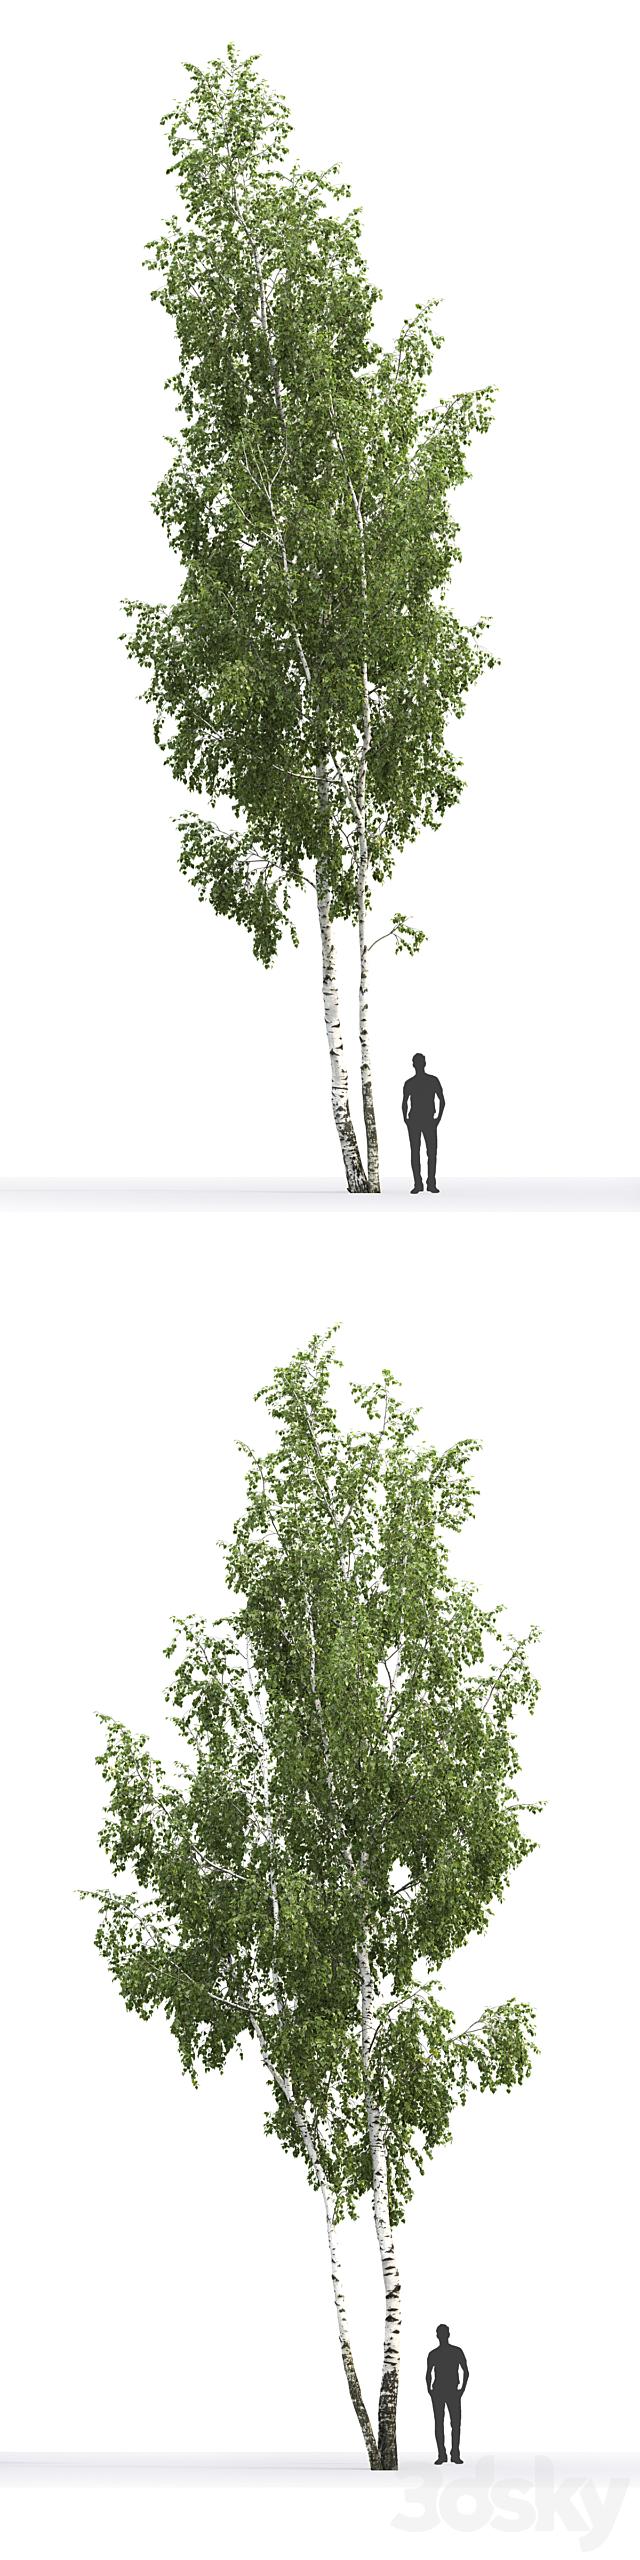 Birch # 6 (14.5m)